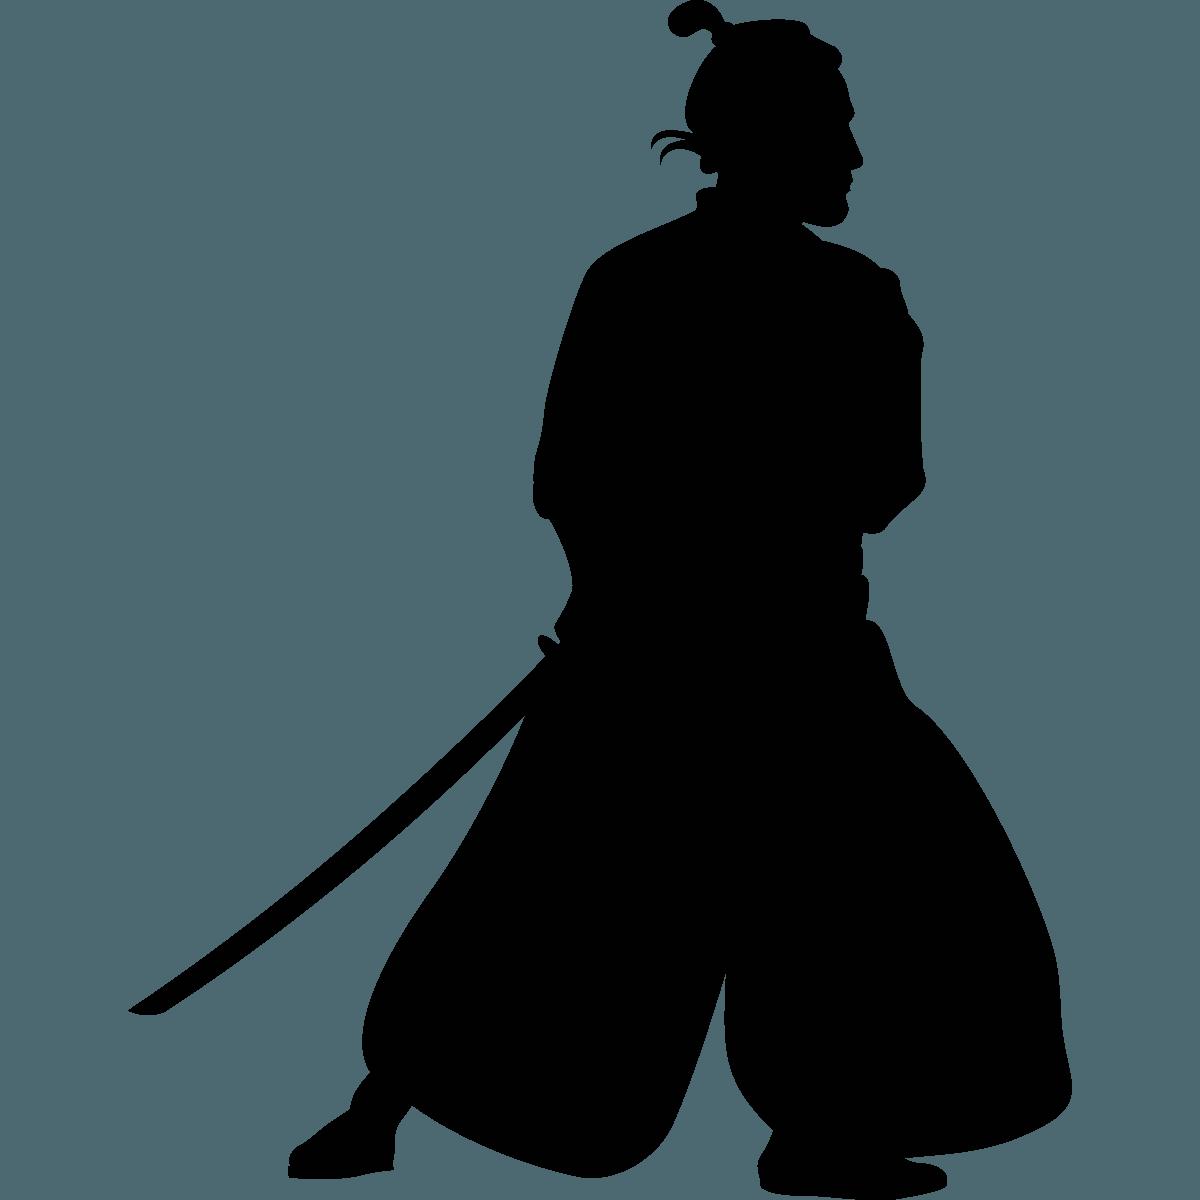 World of Samurai - The story of a Nameless Warrior